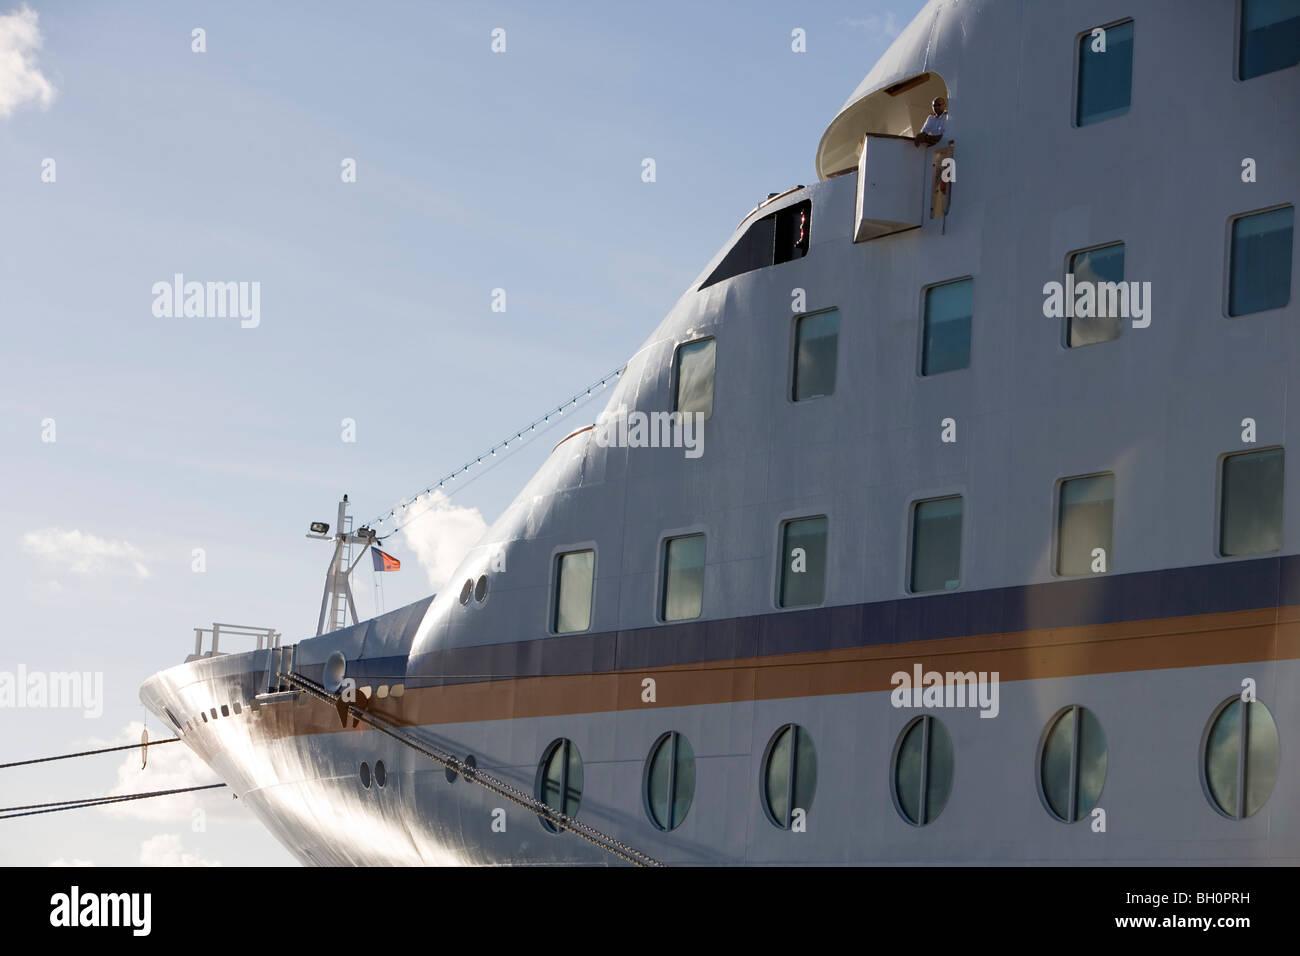 Bow of MV Columbus in the sunlight, Nuku'alofa, Tongatapu, Tonga, South Pacific, Oceania Stock Photo